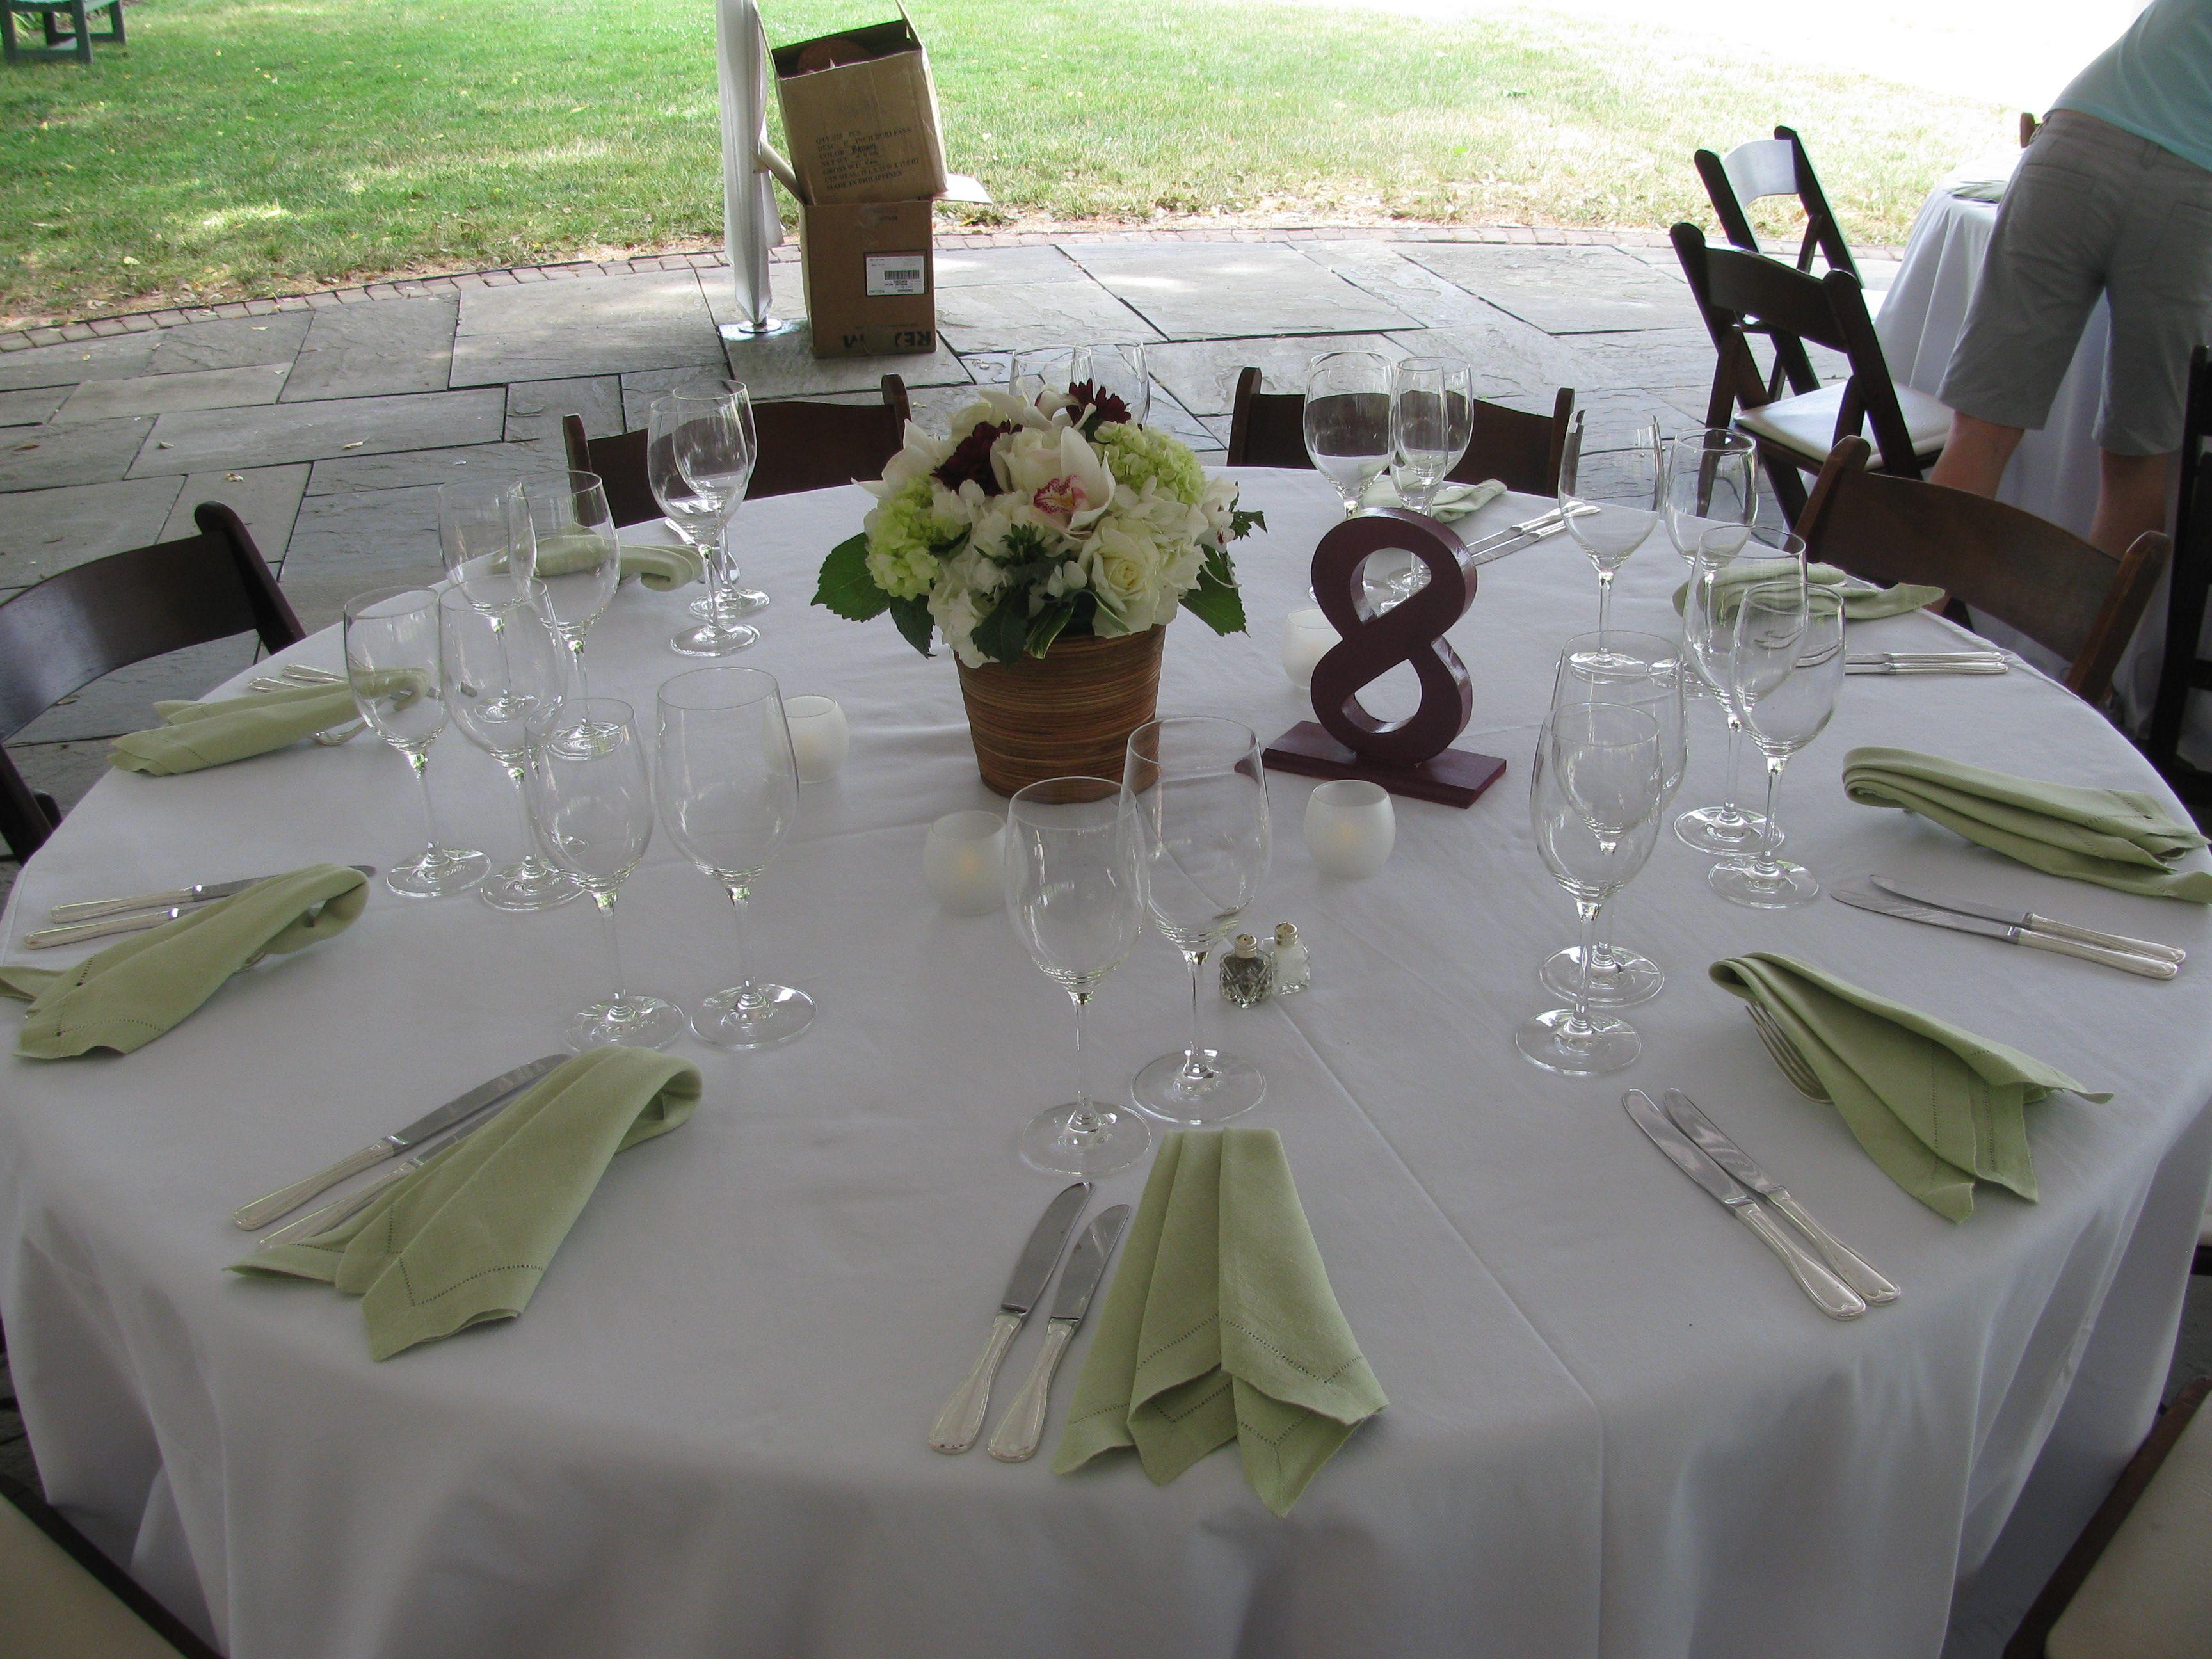 Sneak Peek River Farm Wedding. Wedding Table SettingsWedding ... & Sneak Peek: River Farm Wedding | Farming Garden wedding and Wedding ...